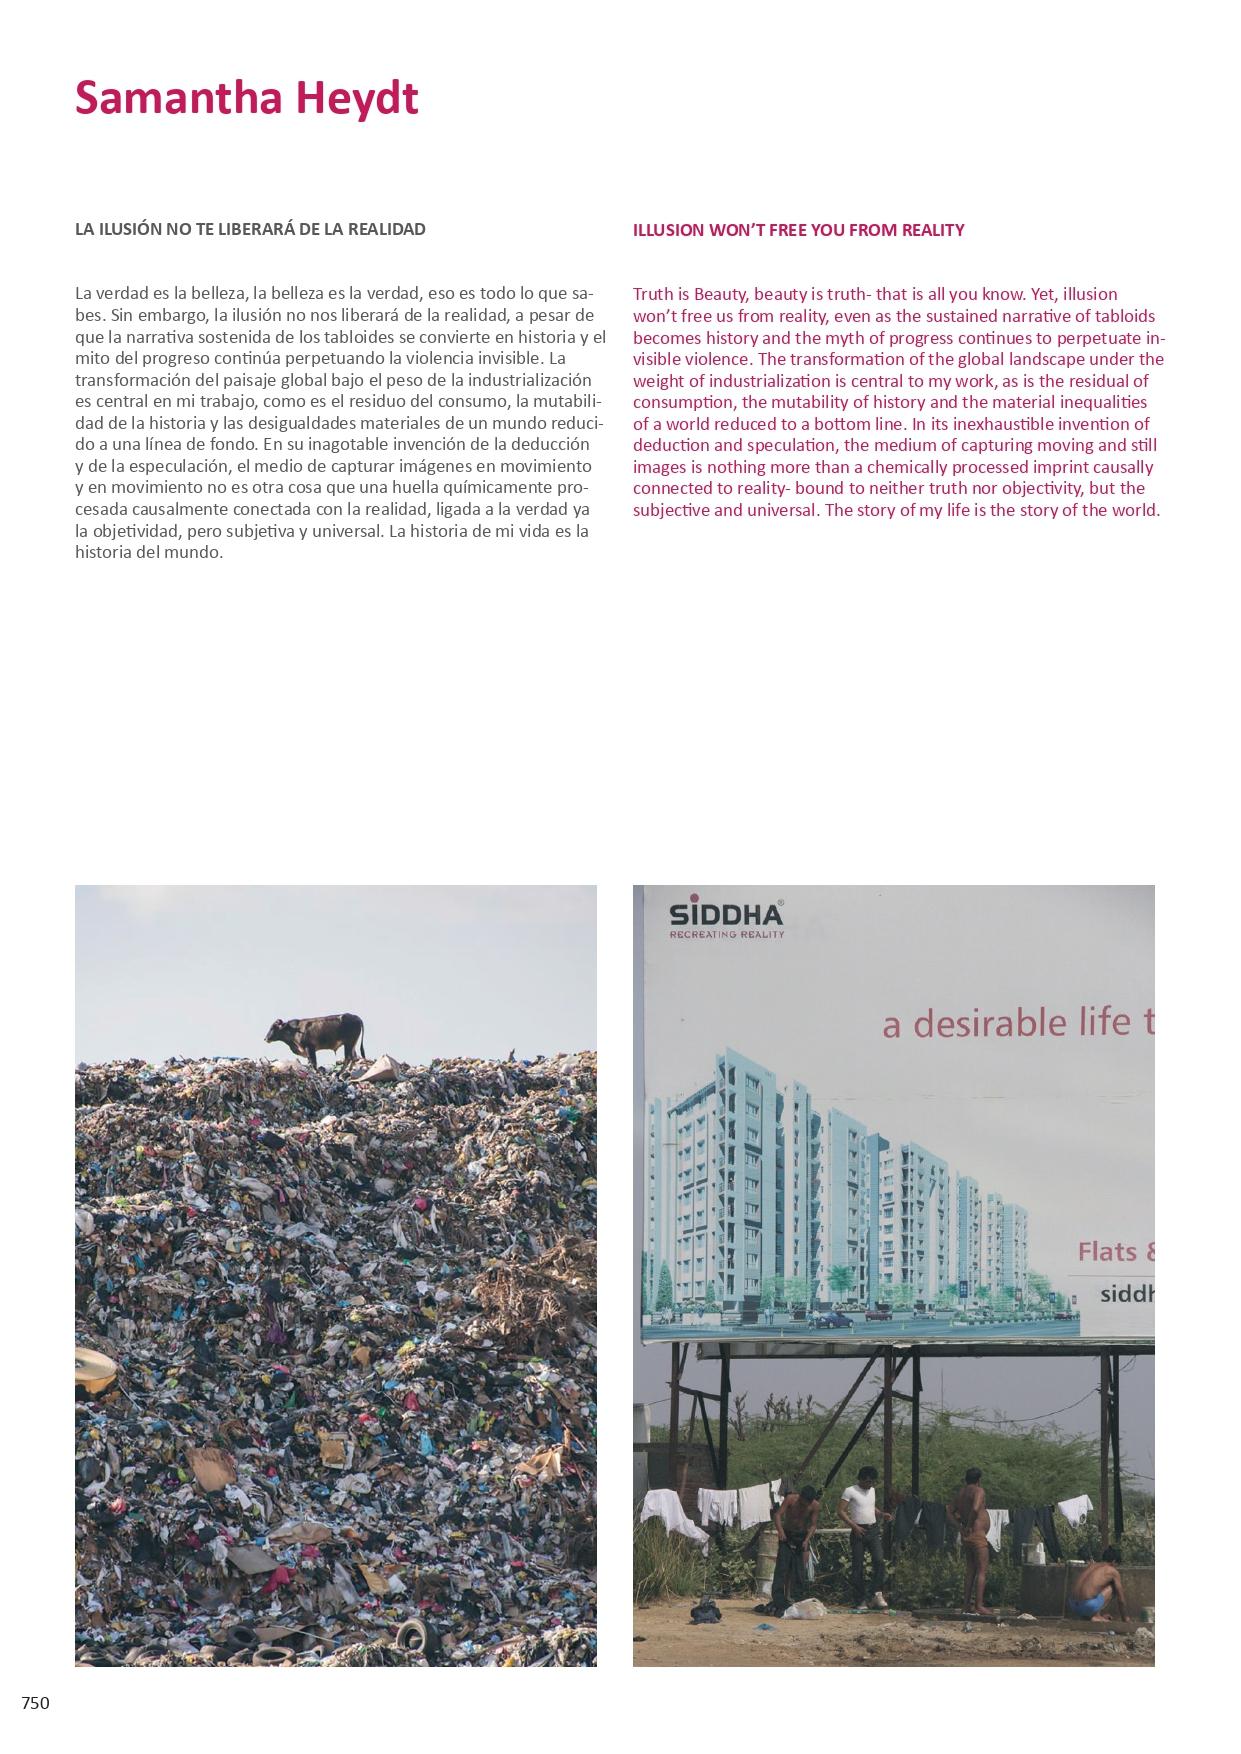 Encuentro Impact 10 Digital_page-0004.jpg